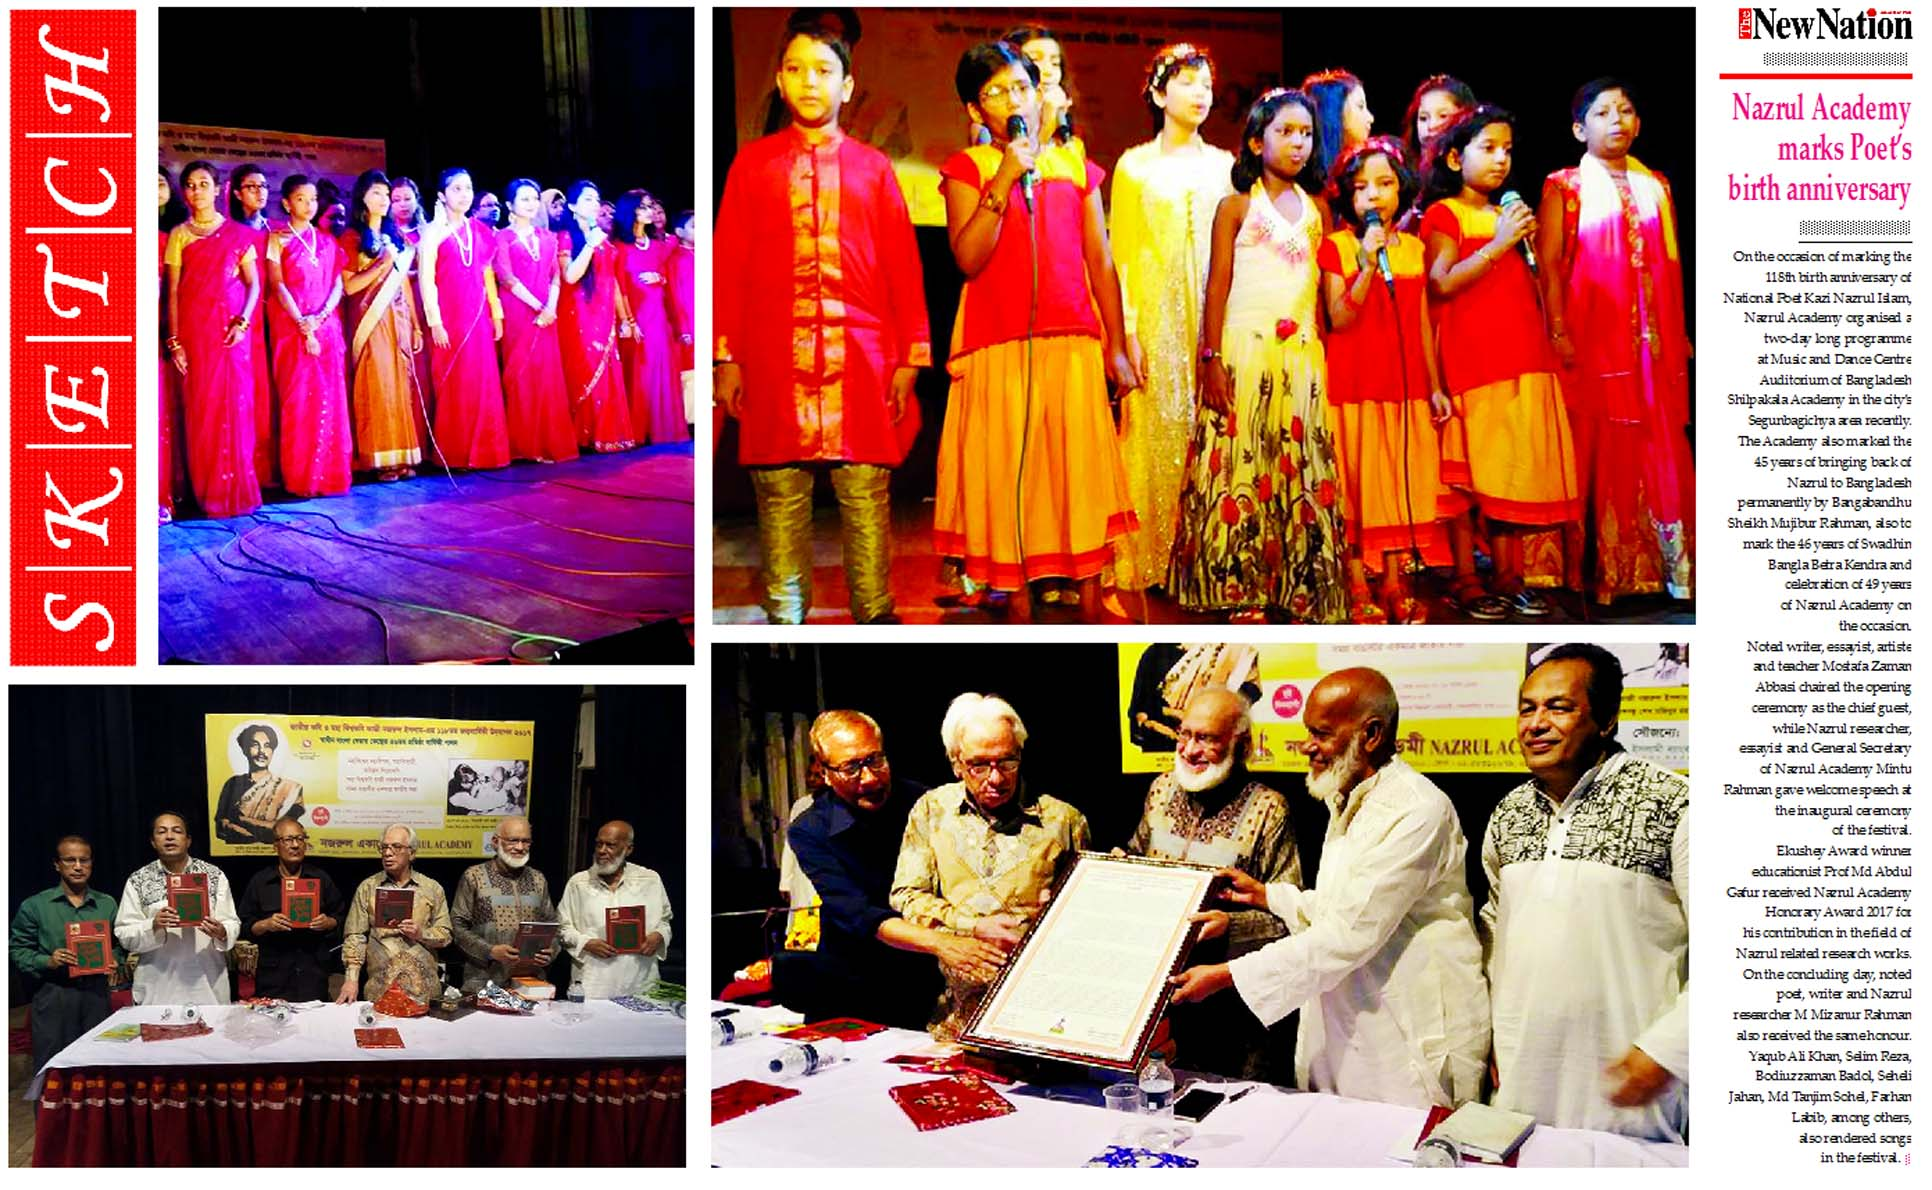 Nazrul Academy marks Poet's birth anniversary